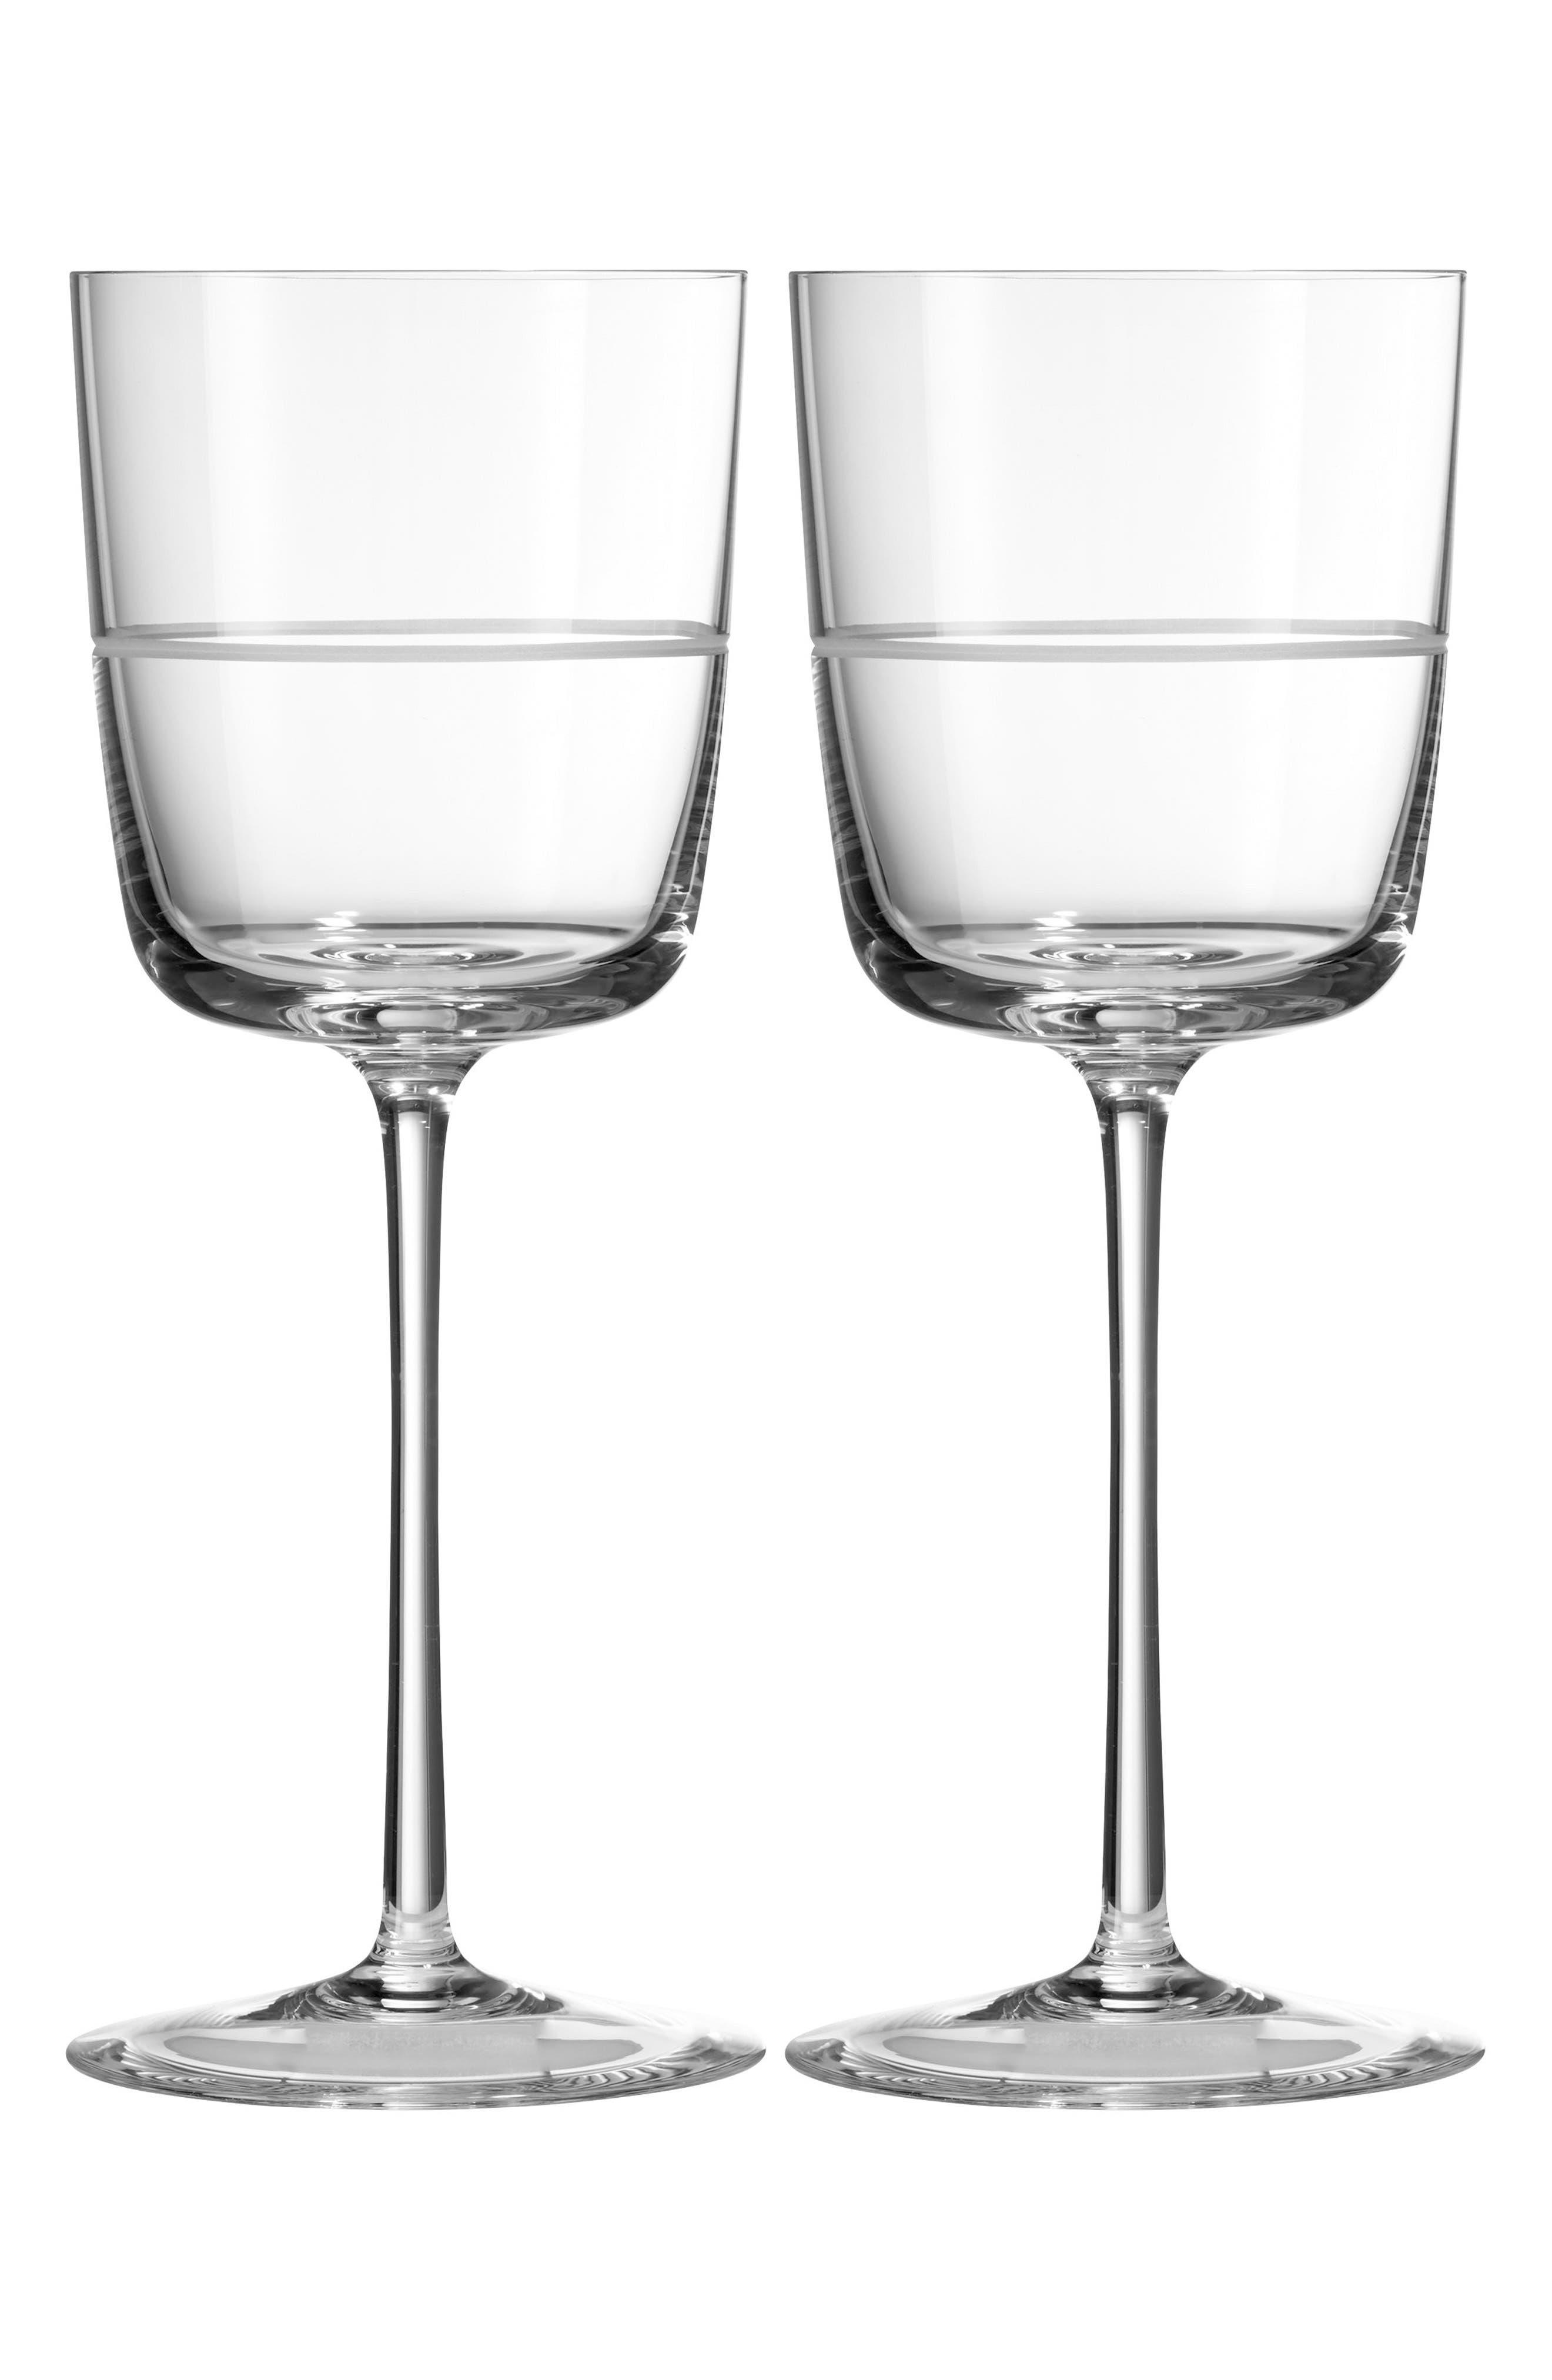 Alternate Image 1 Selected - Vera Wang x Wedgwood Vera Bande Set of 2 Wine Glasses